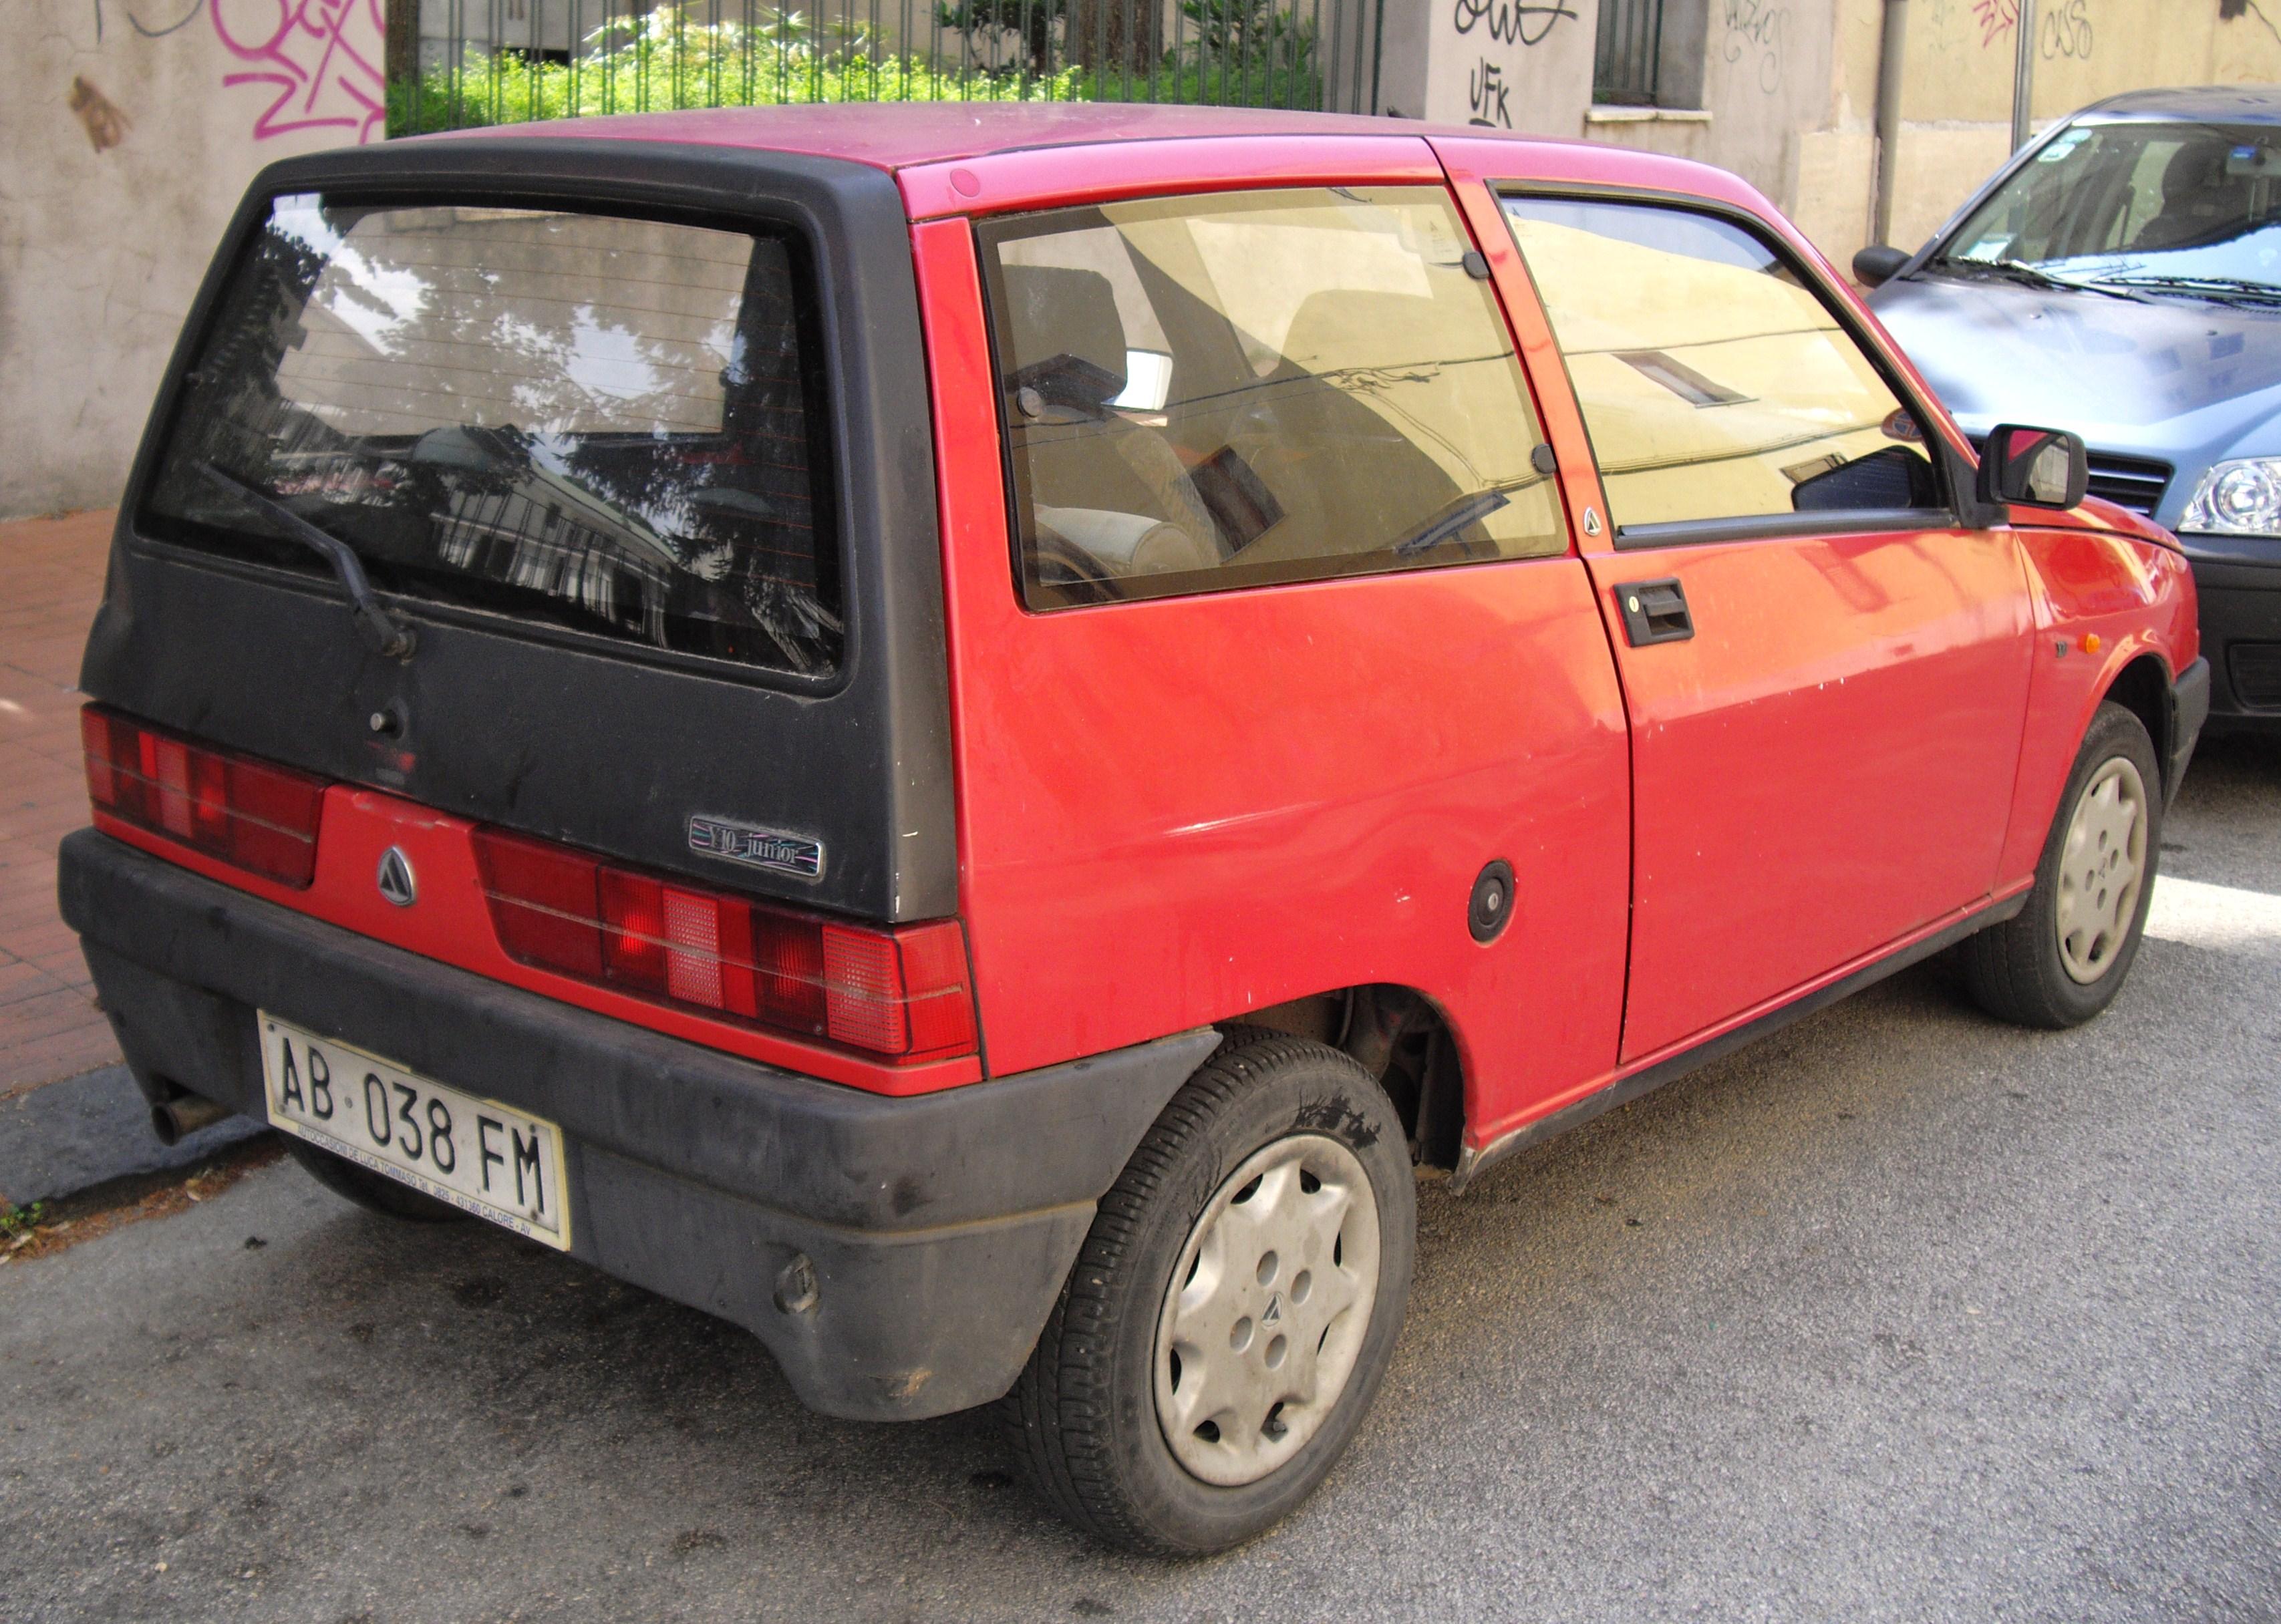 File:Autobianchi Y10 II rear.jpg - Wikimedia Commons